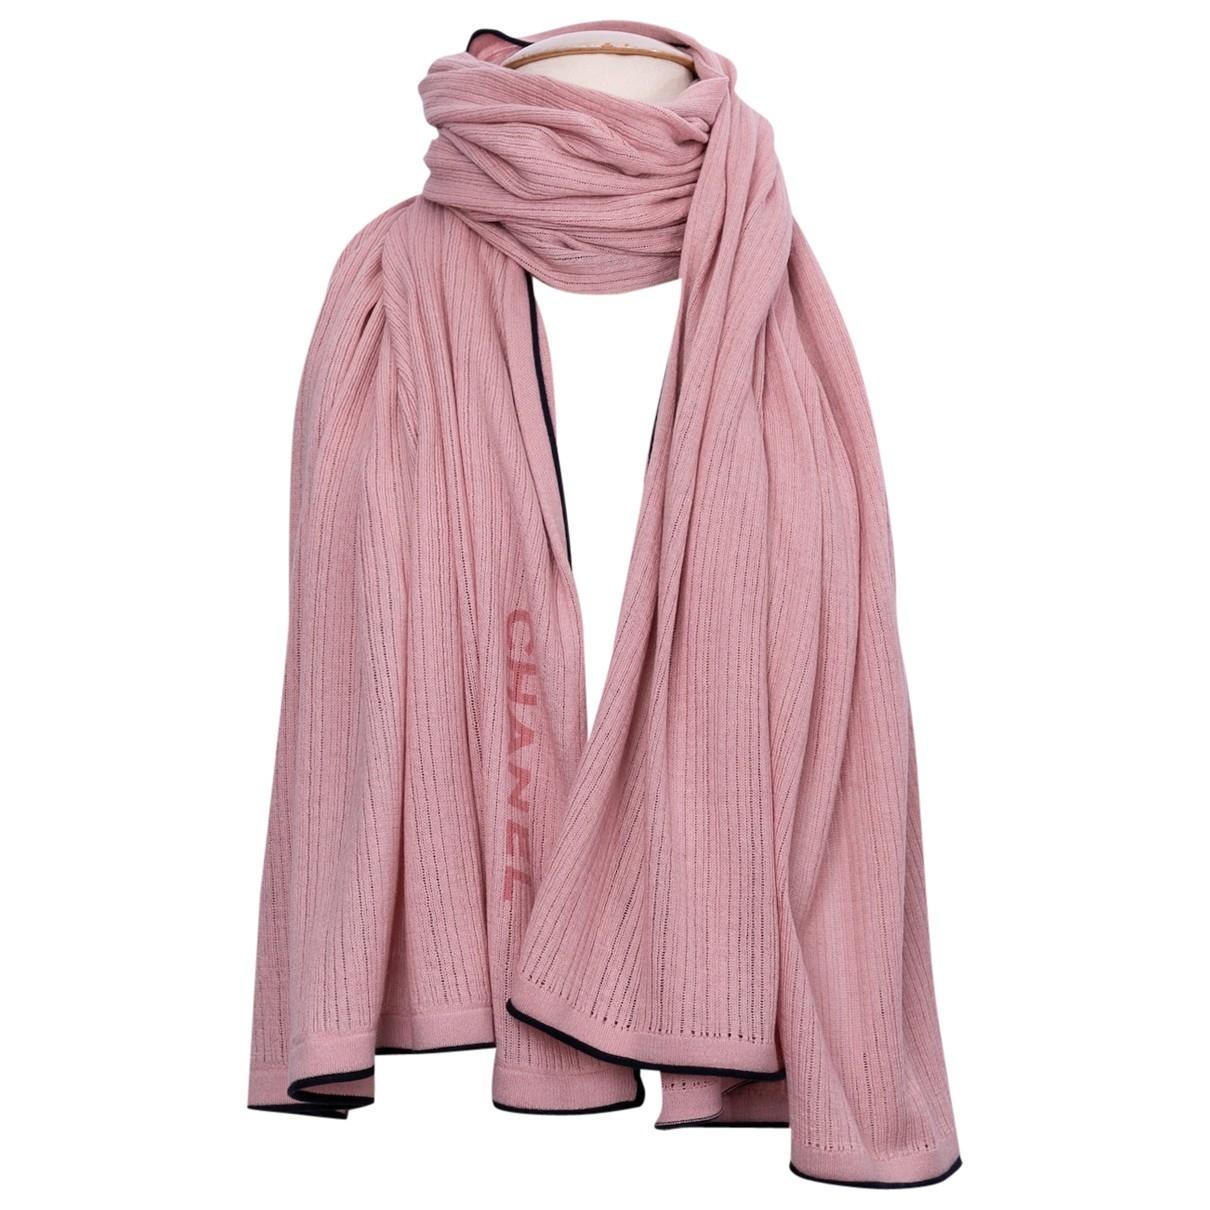 Chanel \N Schal in  Rosa Kaschmir